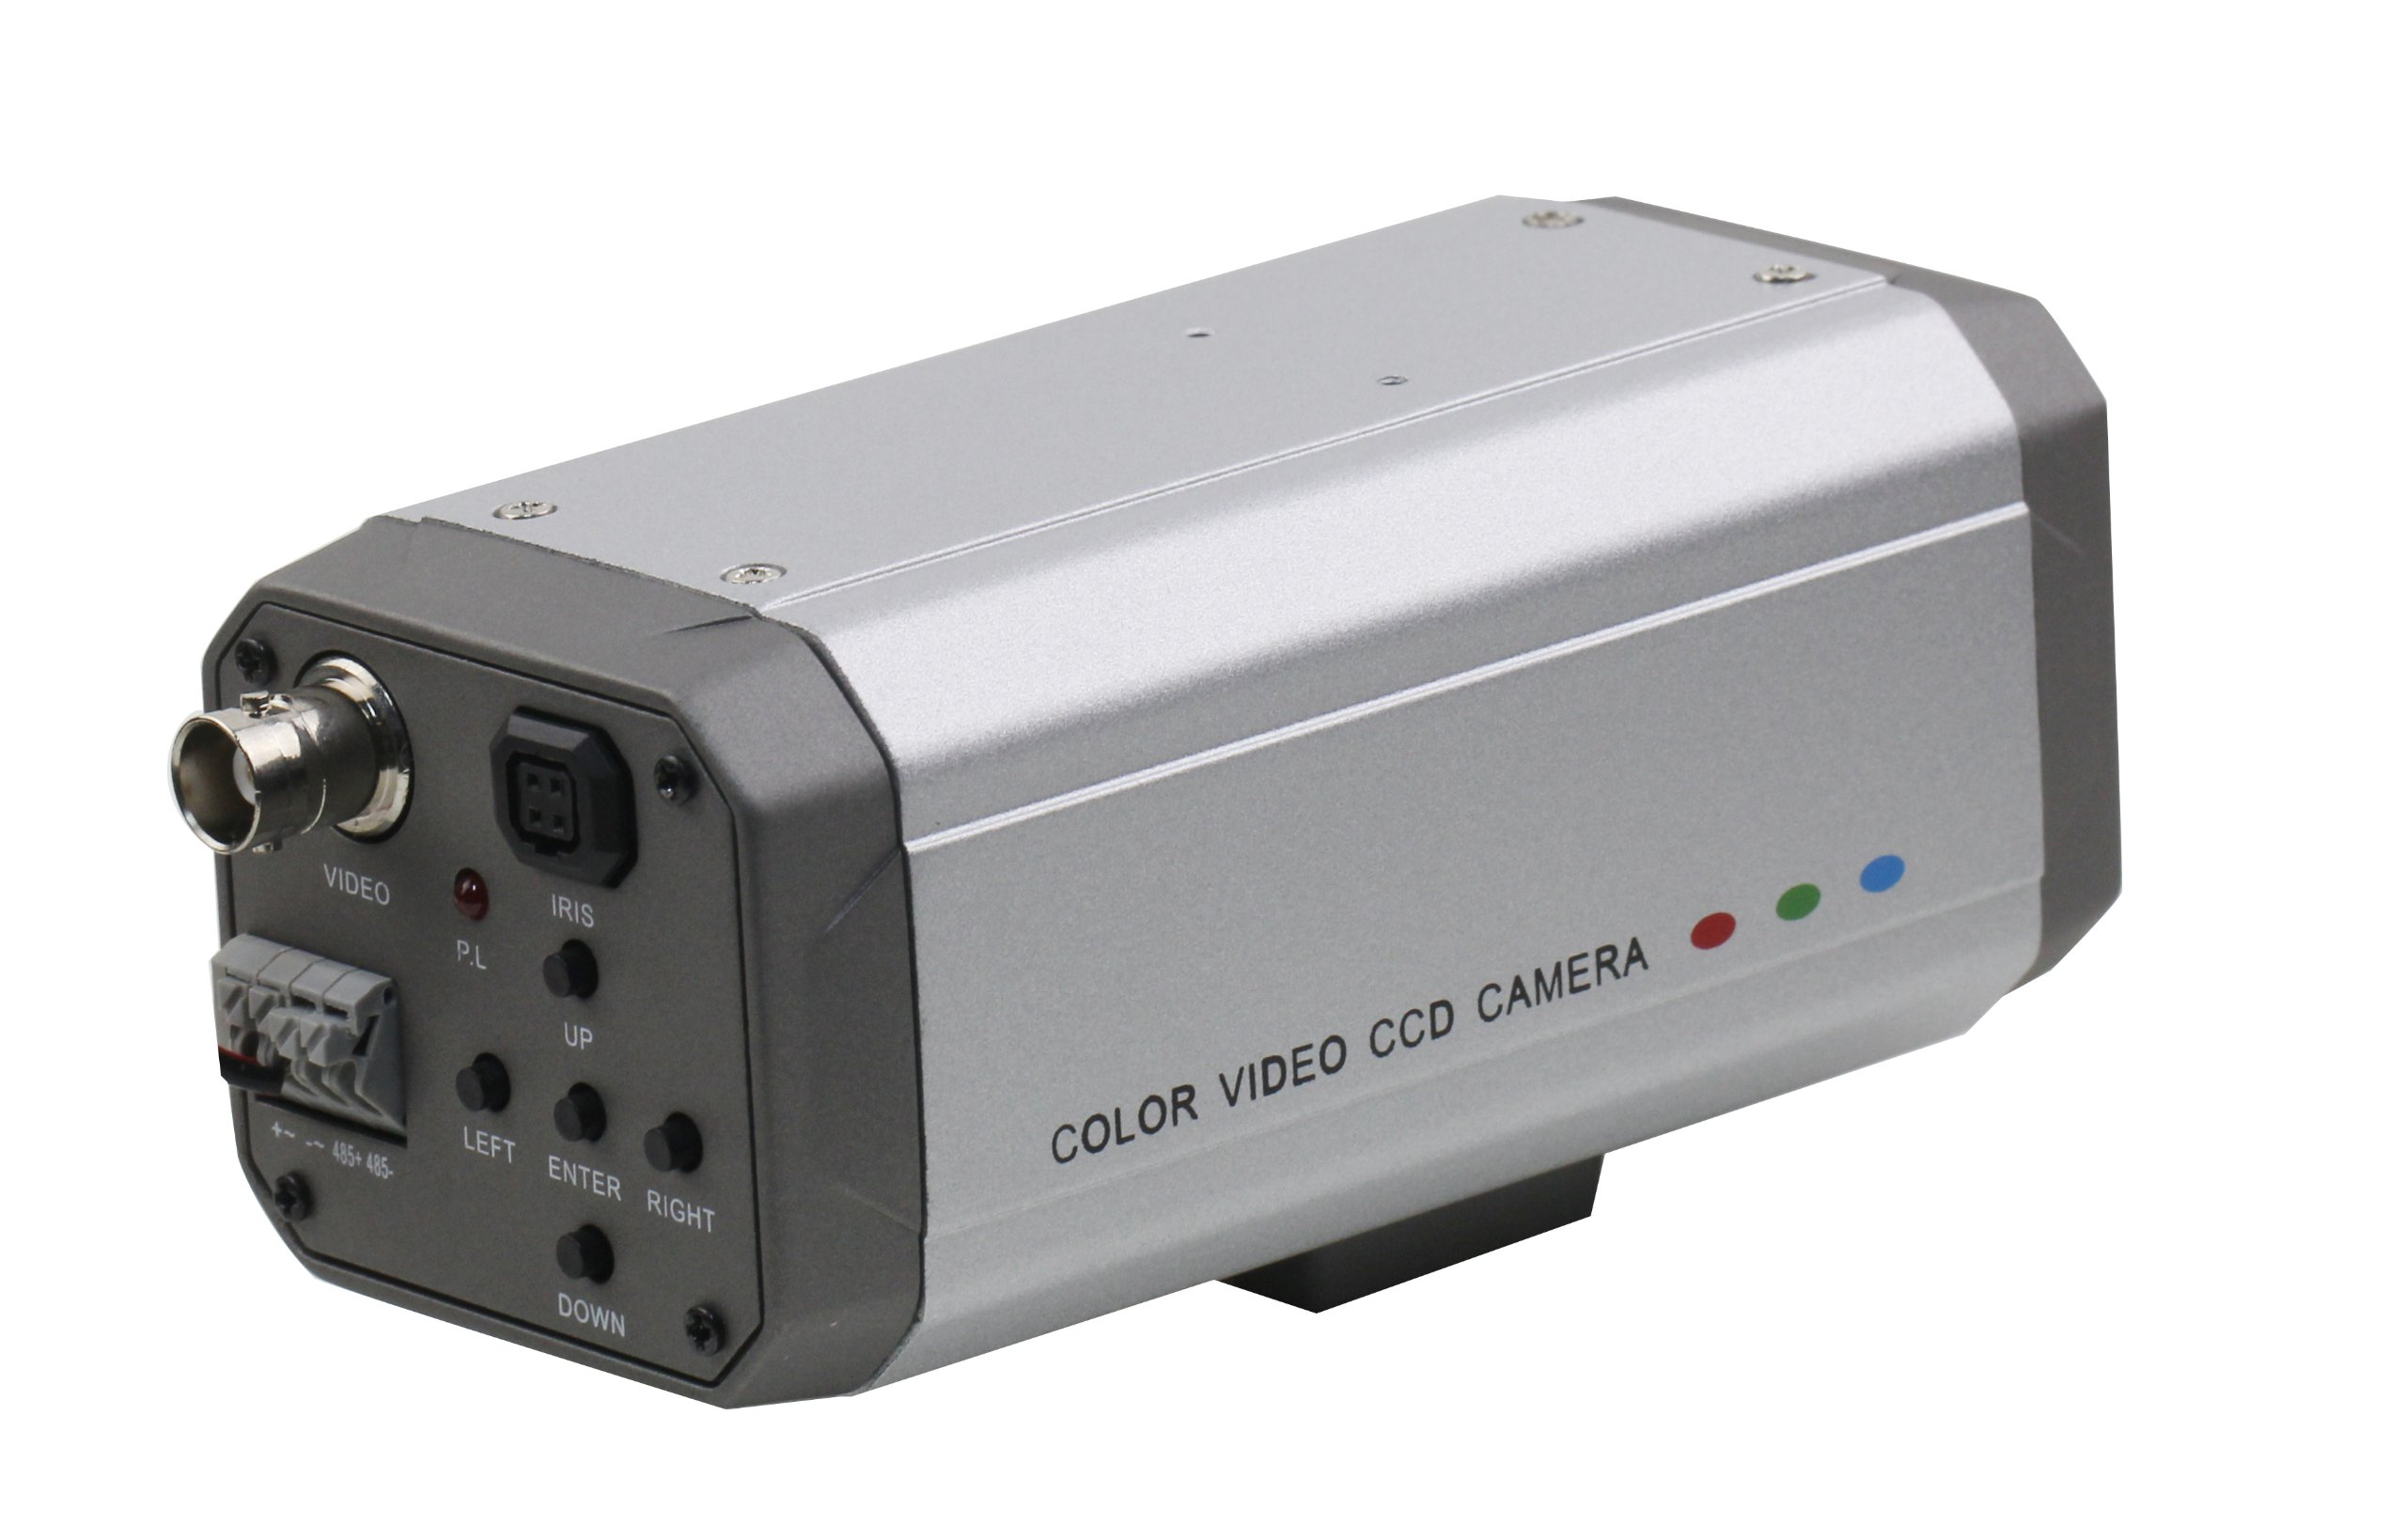 USG Pro Box Security Camera: HD-SDI hdCCTV 2.1Megapixels 1080p C/CS Lens Compatible Home/Business Video Surveillance Outdoor/Indoor Use